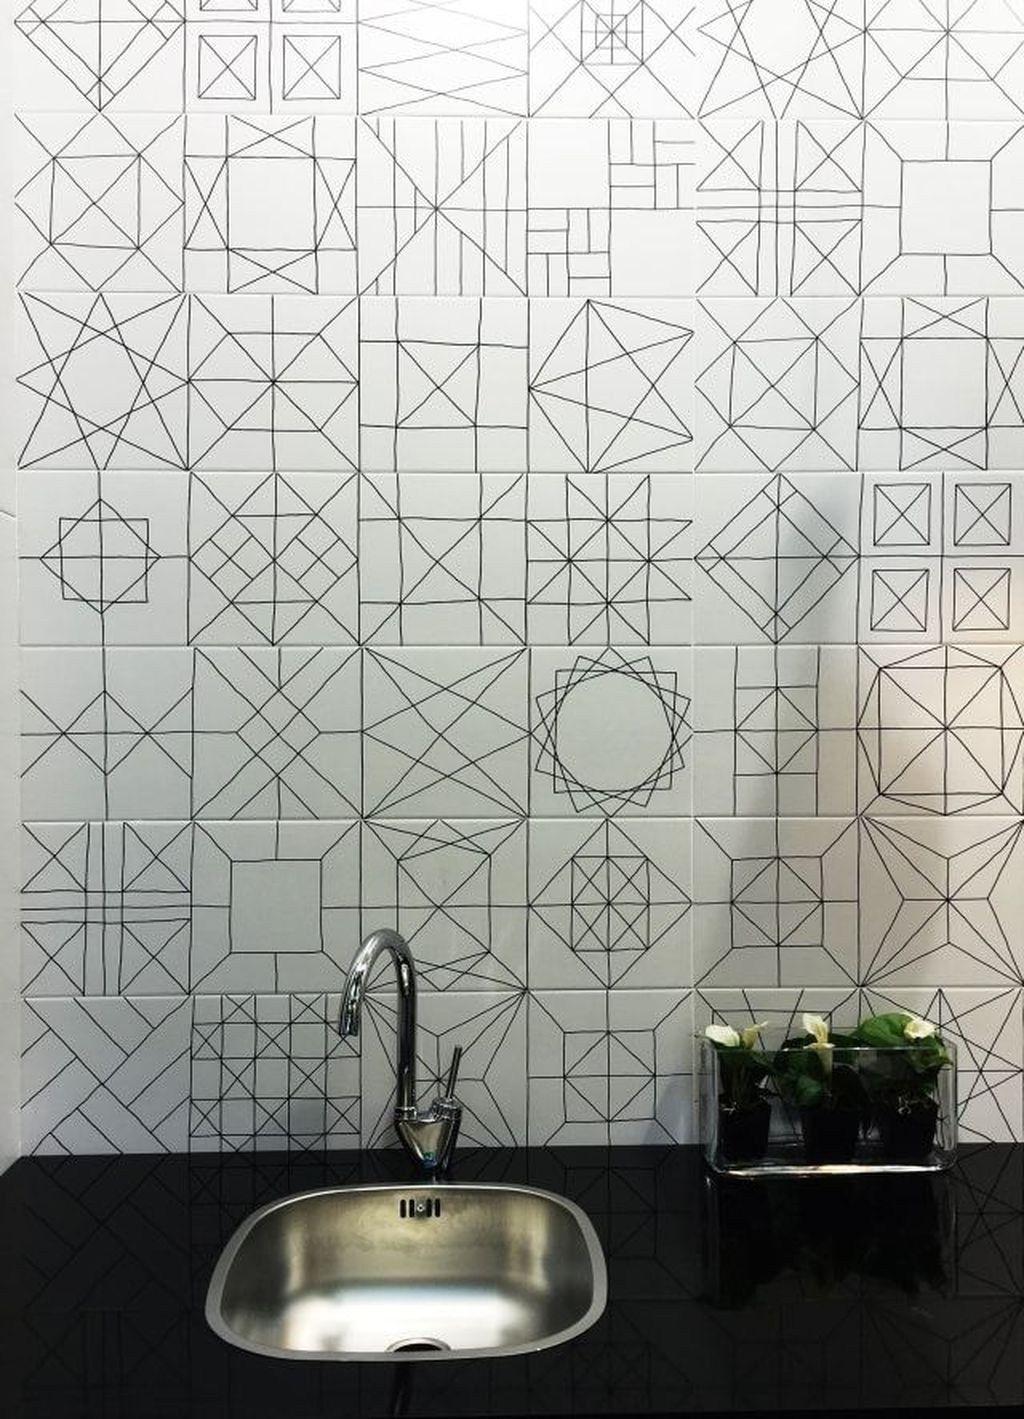 38 Lovely Geometrical Tiles Ideas For Your Bathroom Decoration Trendehouse Bathroom Tile Designs Tile Trends Modern Bathroom Tile